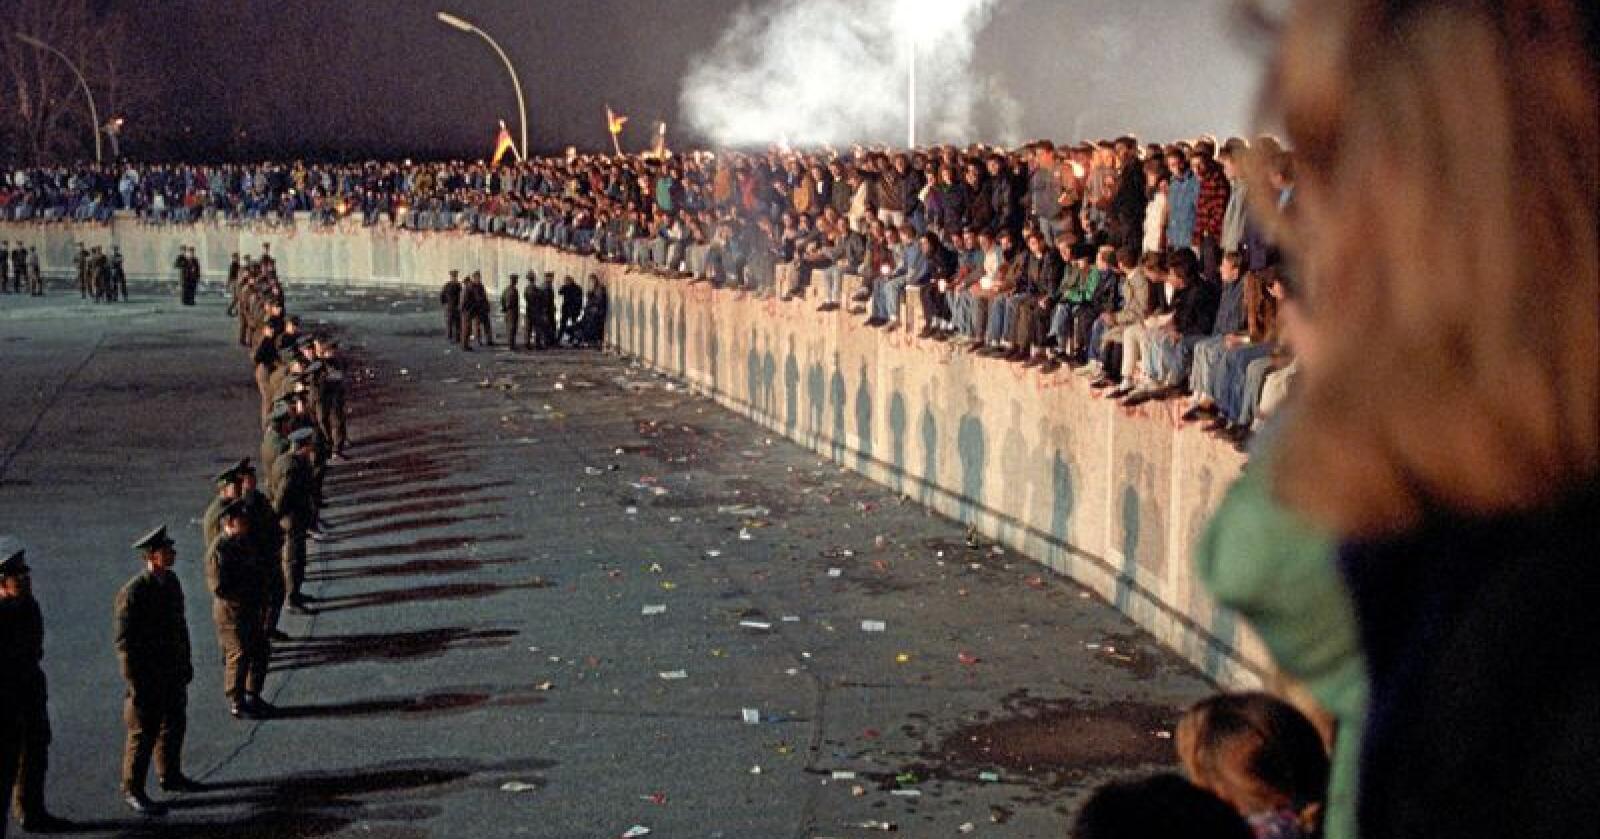 Historisk høst: Muren som delte Berlin og verden i to, falt for 30 år siden. Foto: Jørn H. Moen / NTB scanpix